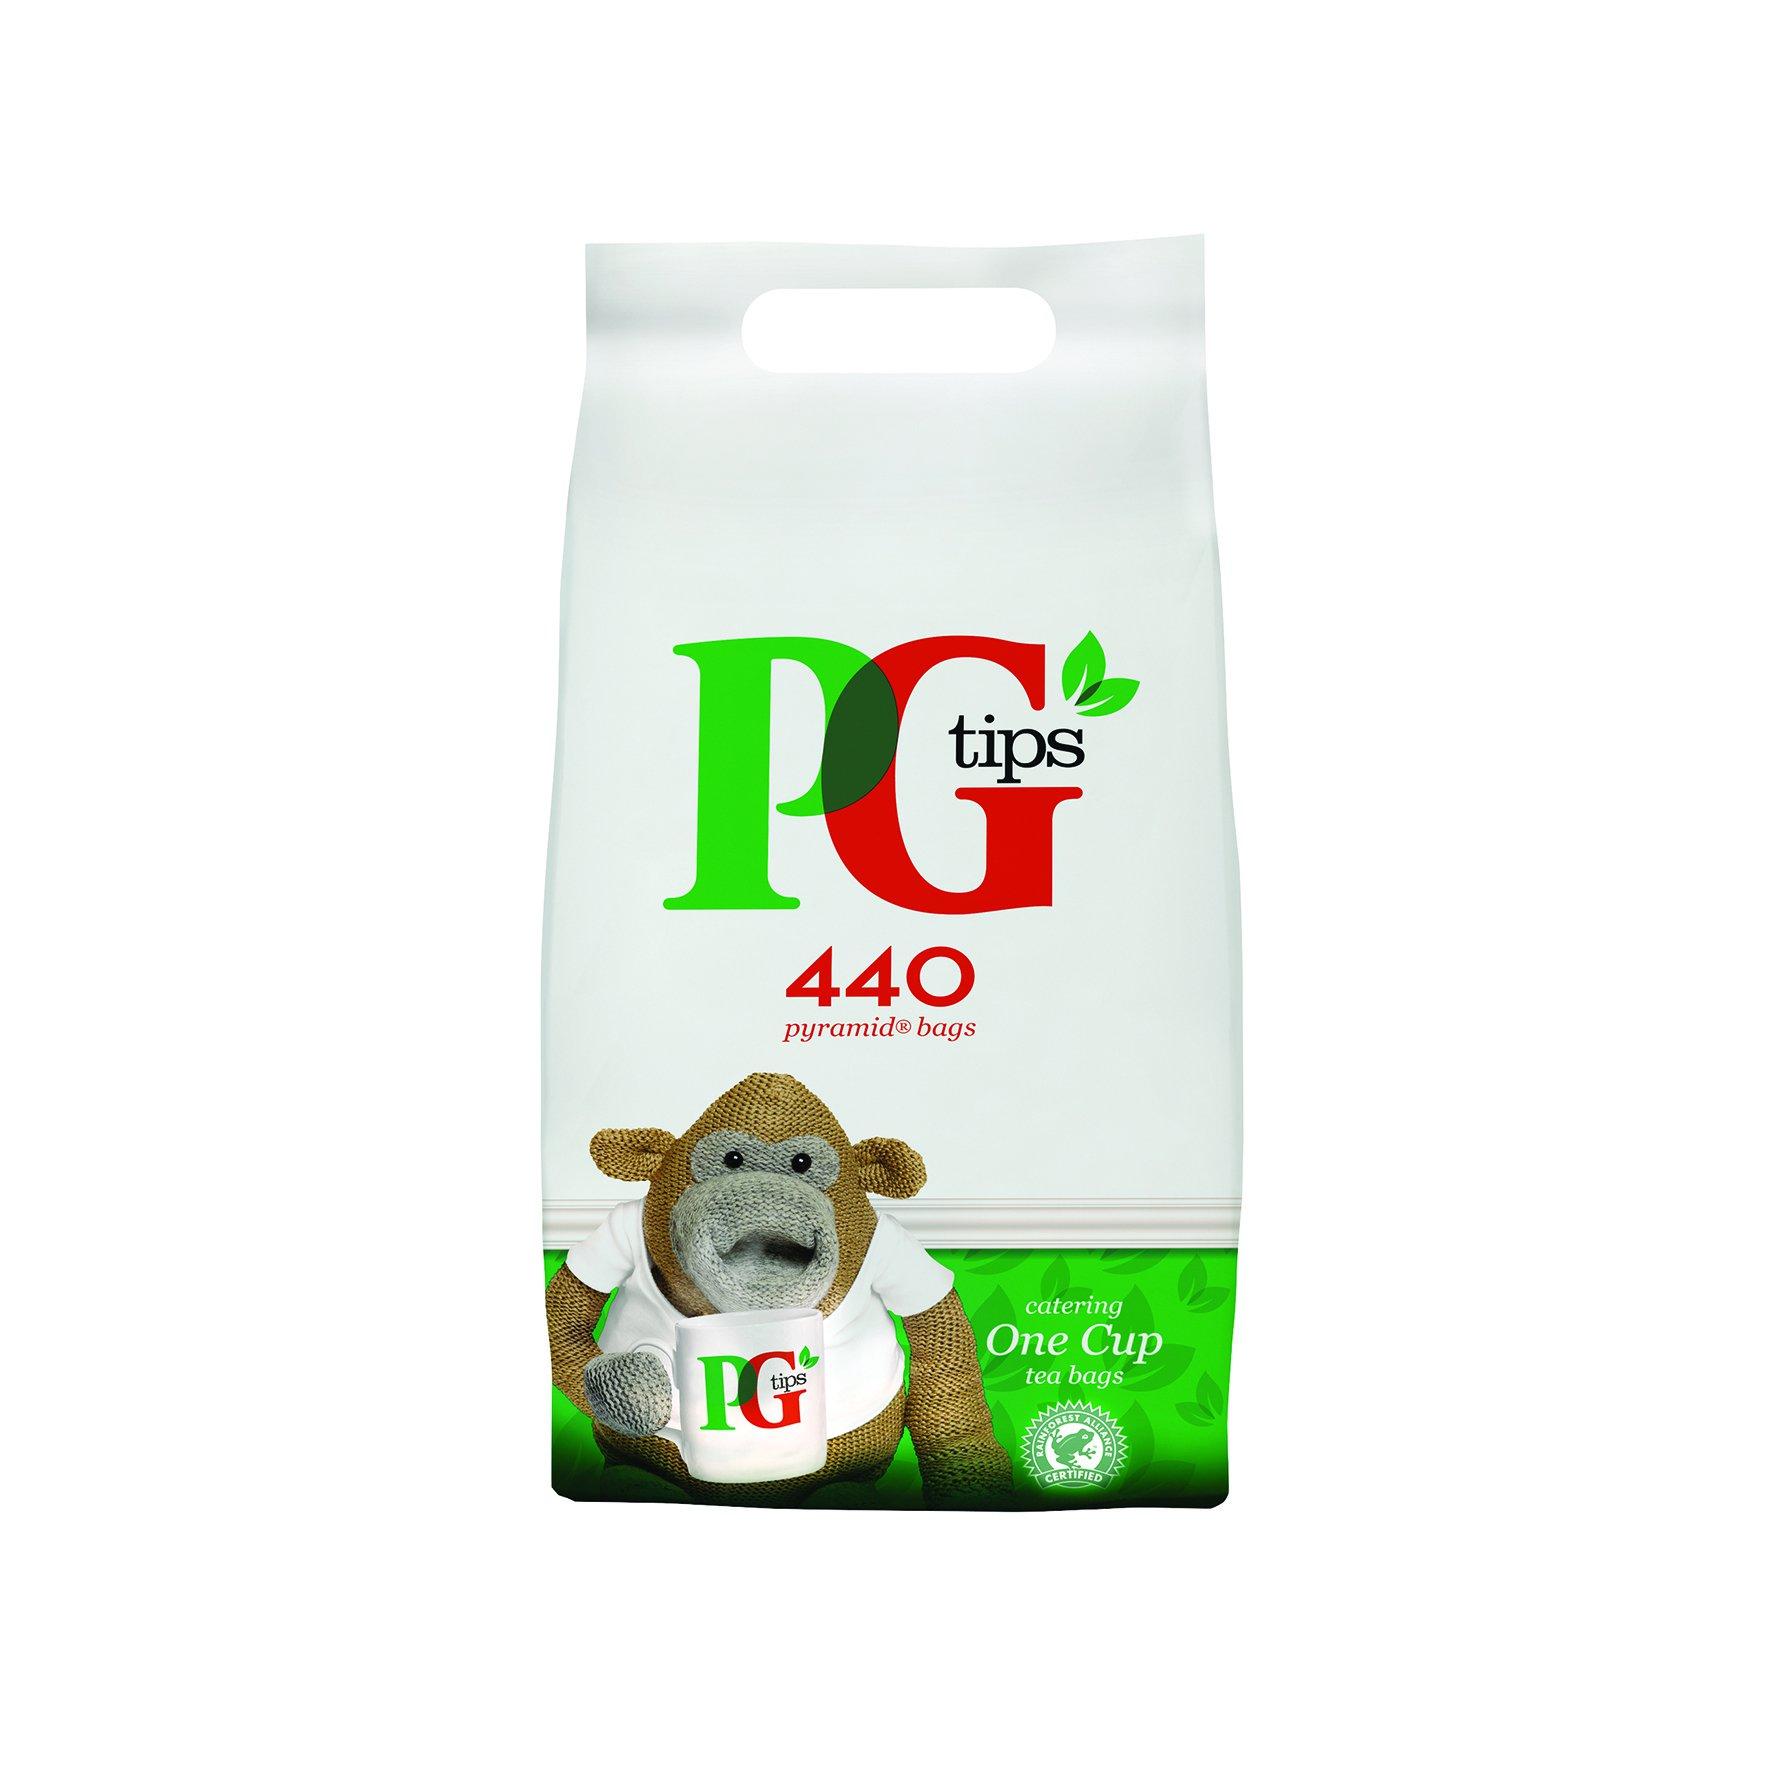 PG Tips Tea Bags (460)